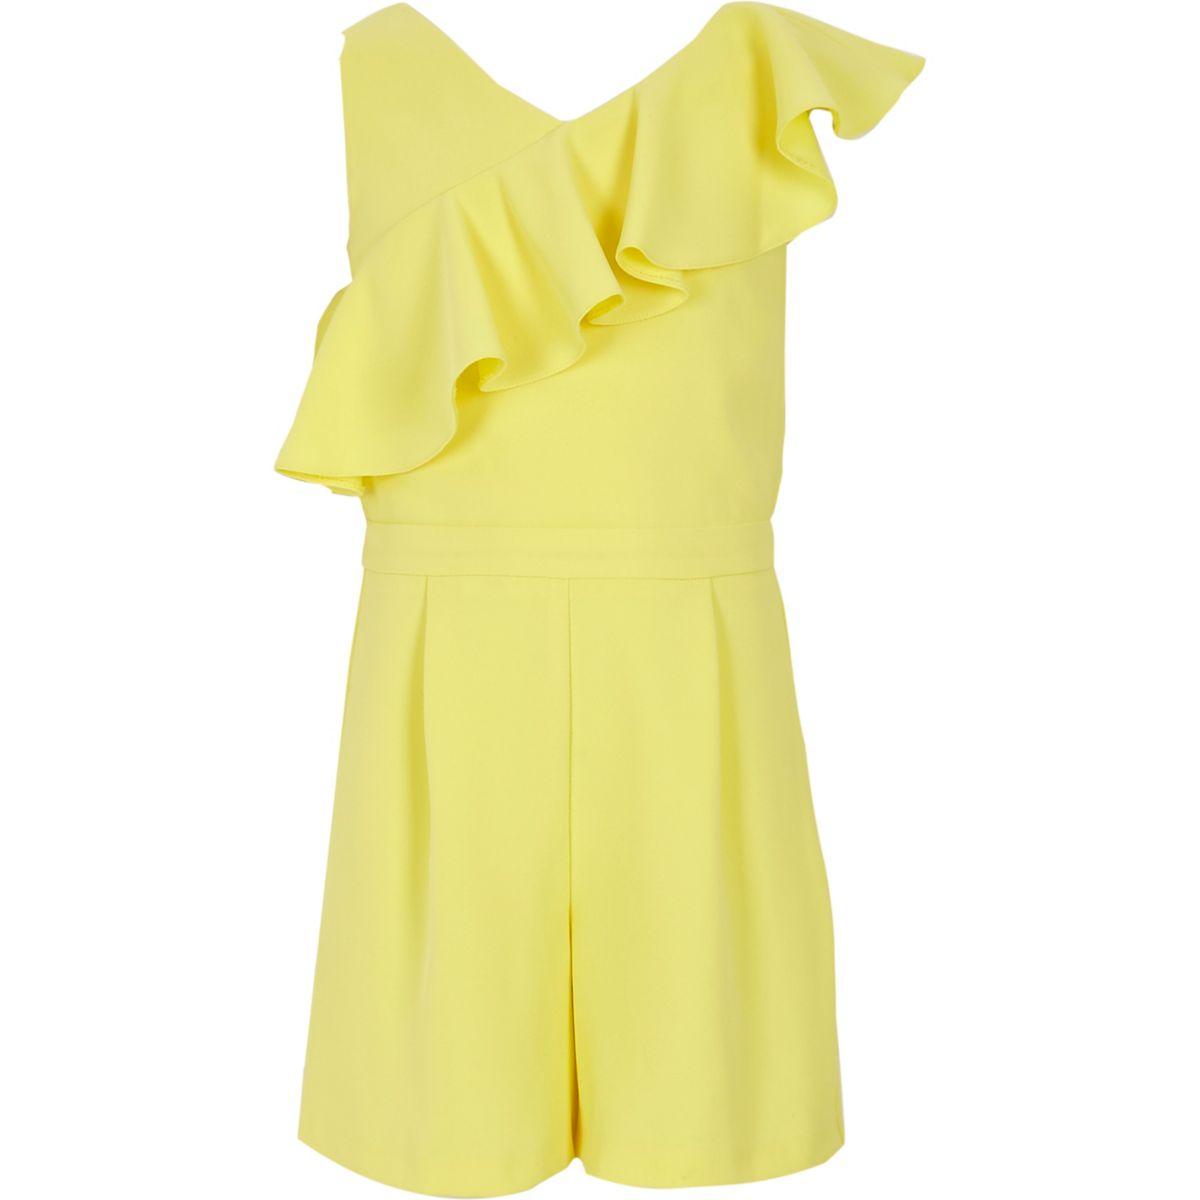 Girls yellow asymmetric frill romper